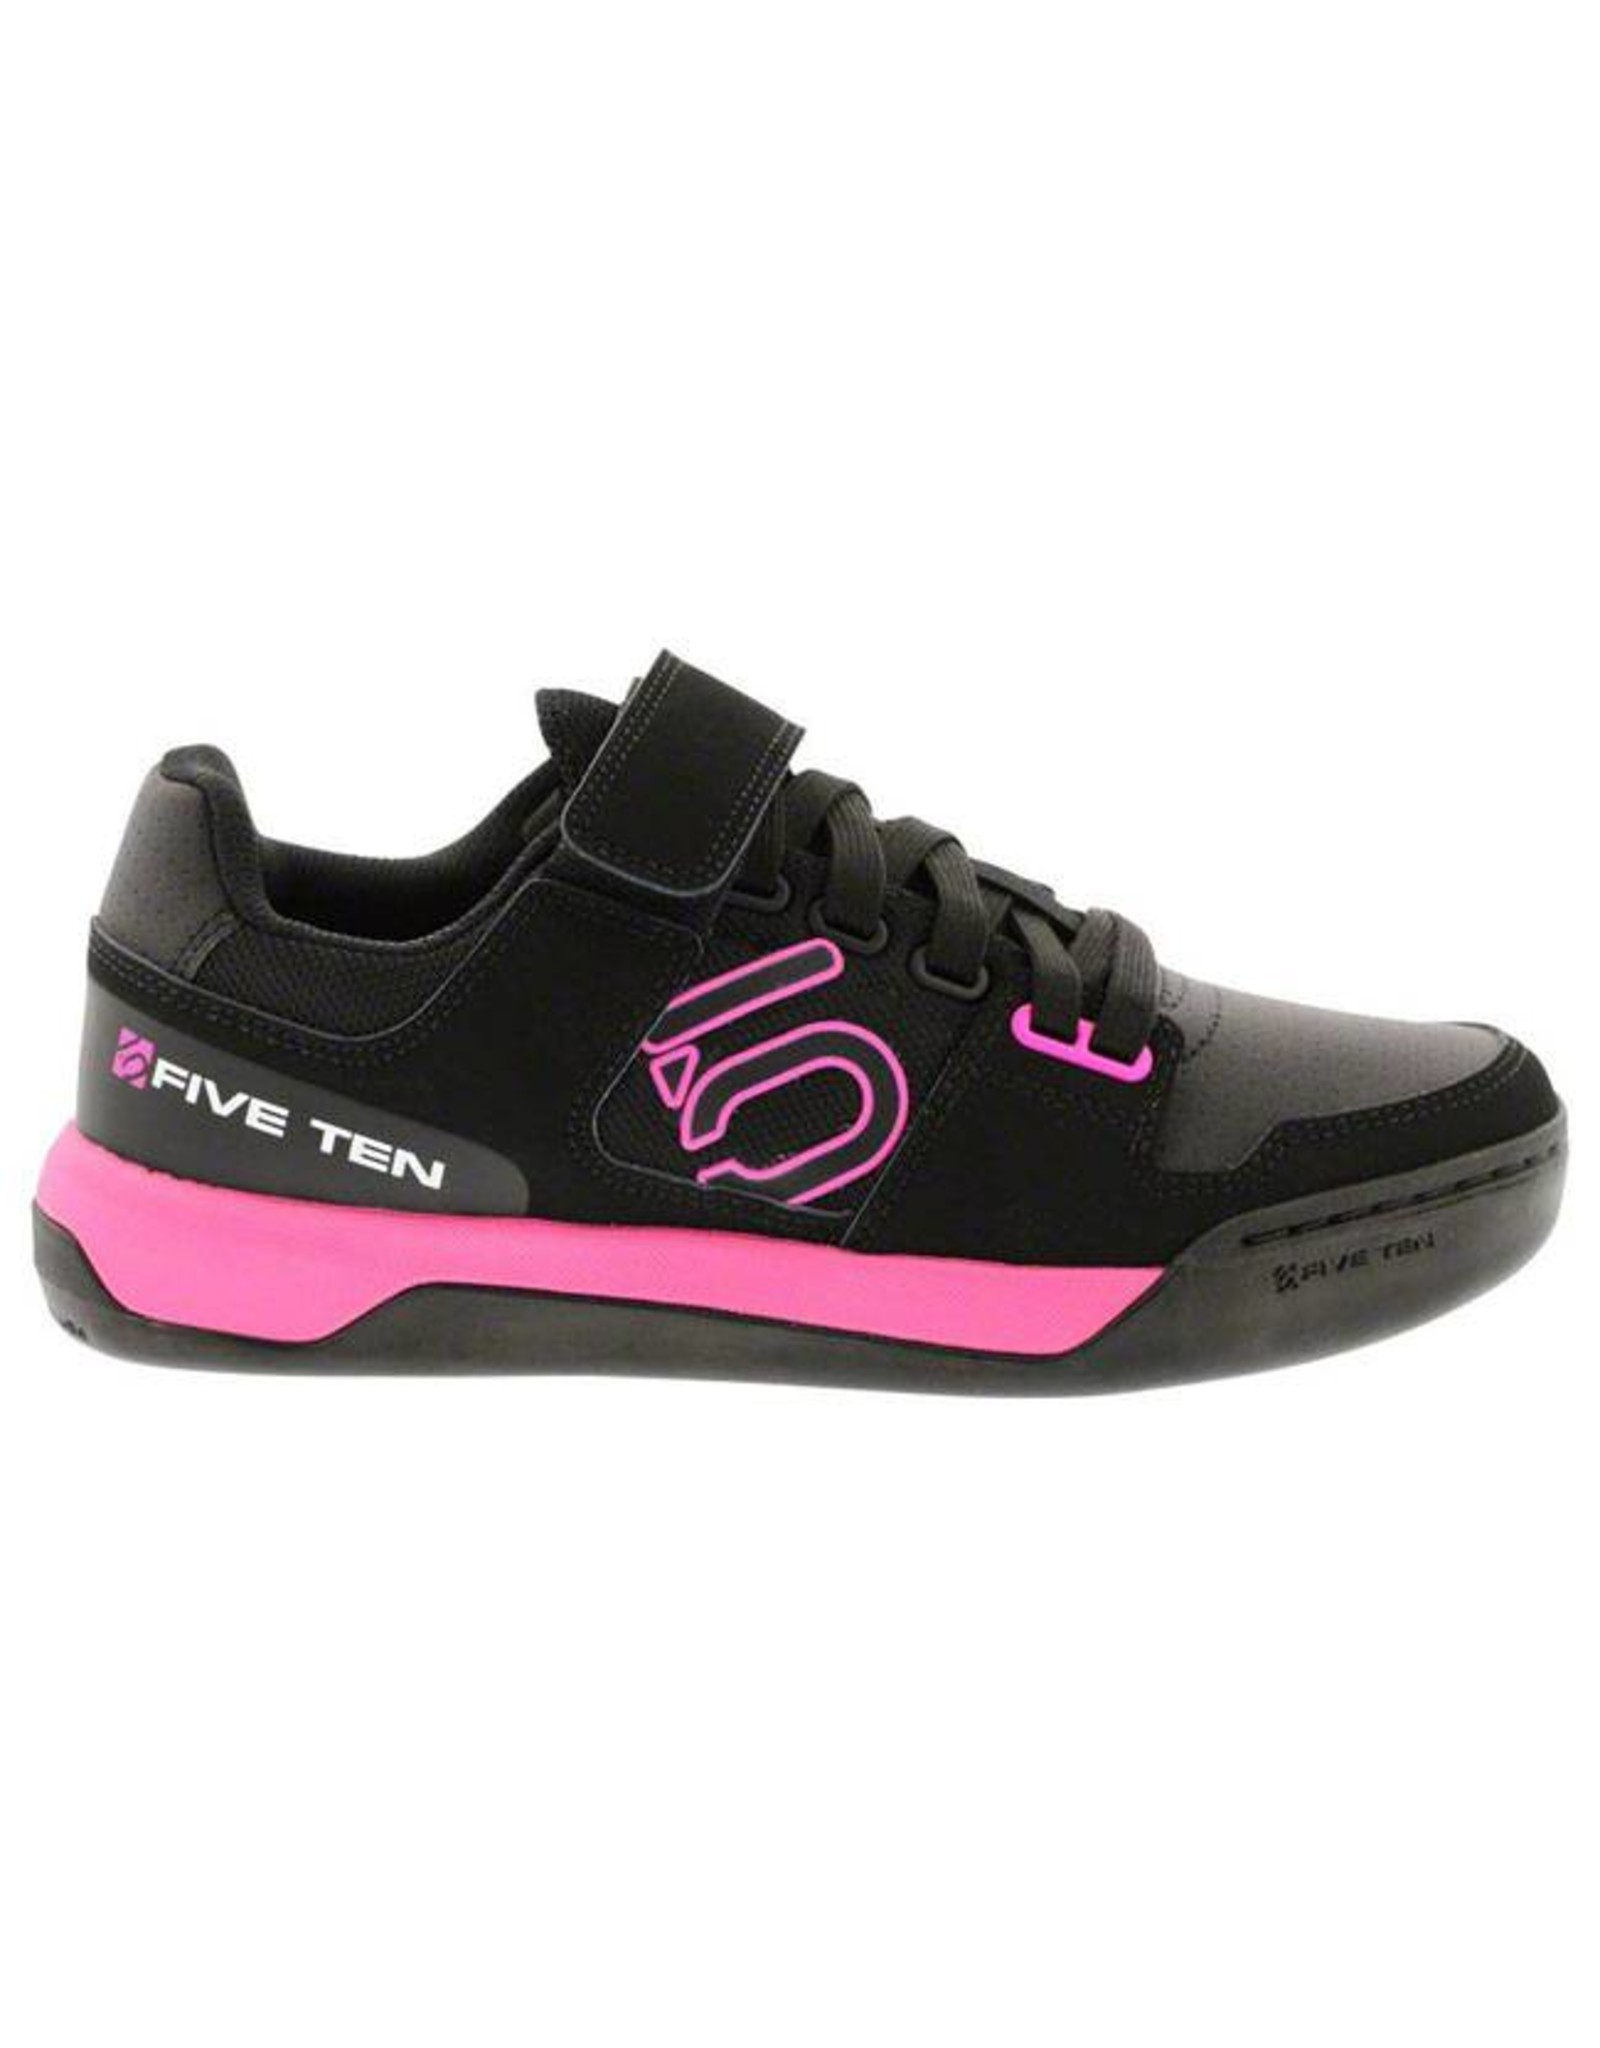 Five Ten Five Ten Hellcat Women's Clipless/Flat Pedal Shoe: Shock Pink 6.5